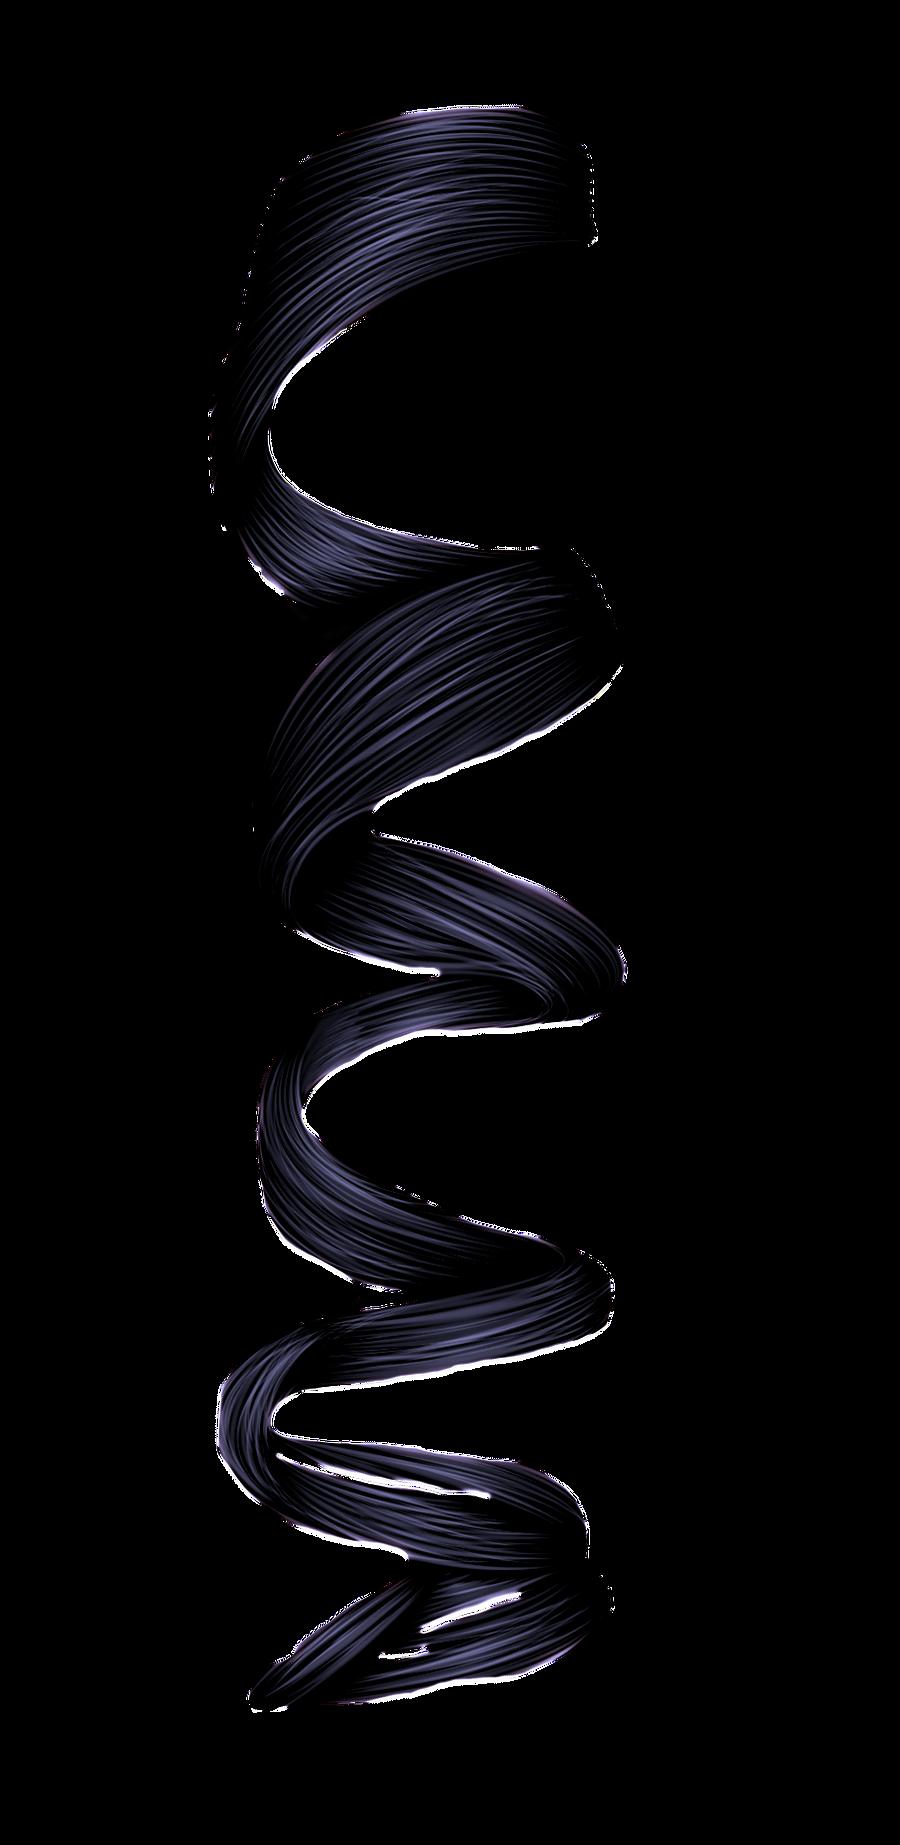 Curl Black By Hellonlegs On Deviantart